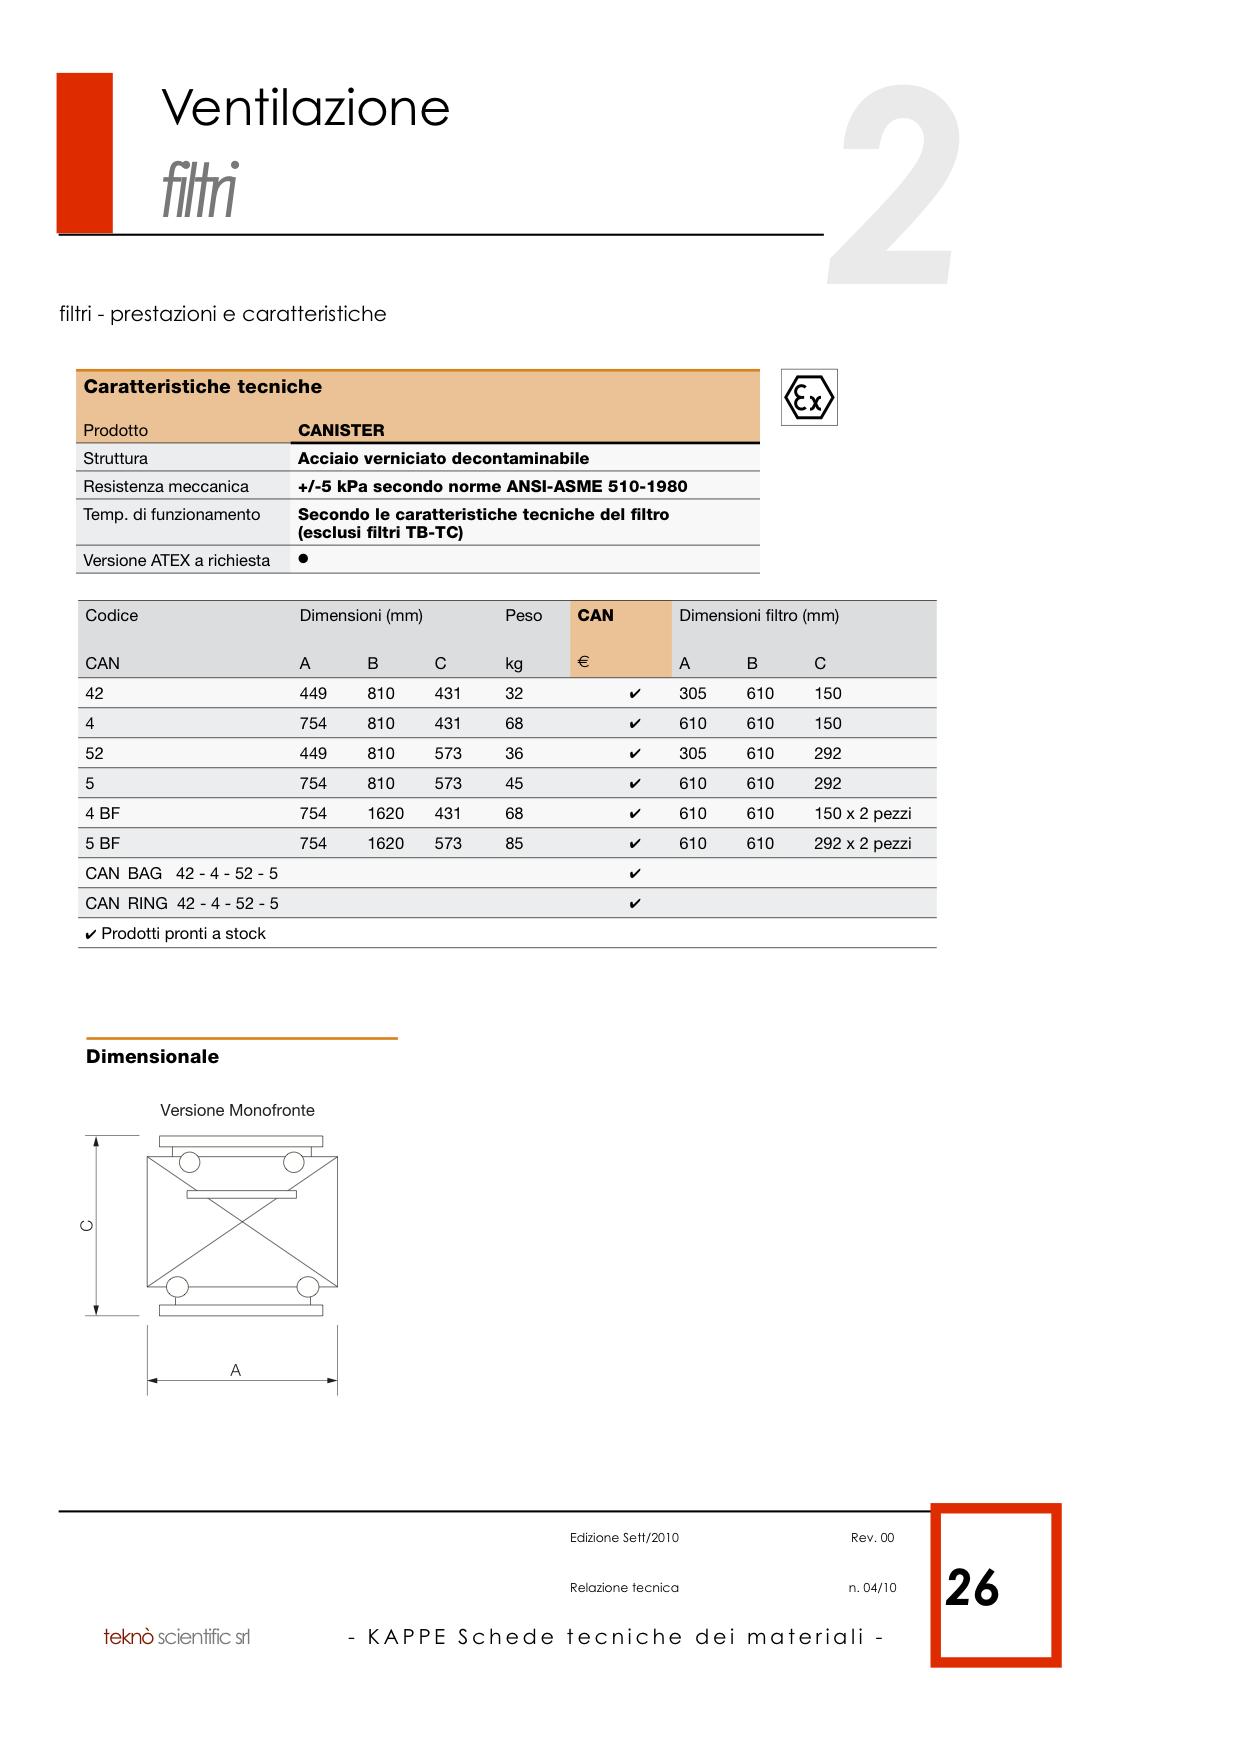 KAPPE Schede tecniche materiali copia 6.png